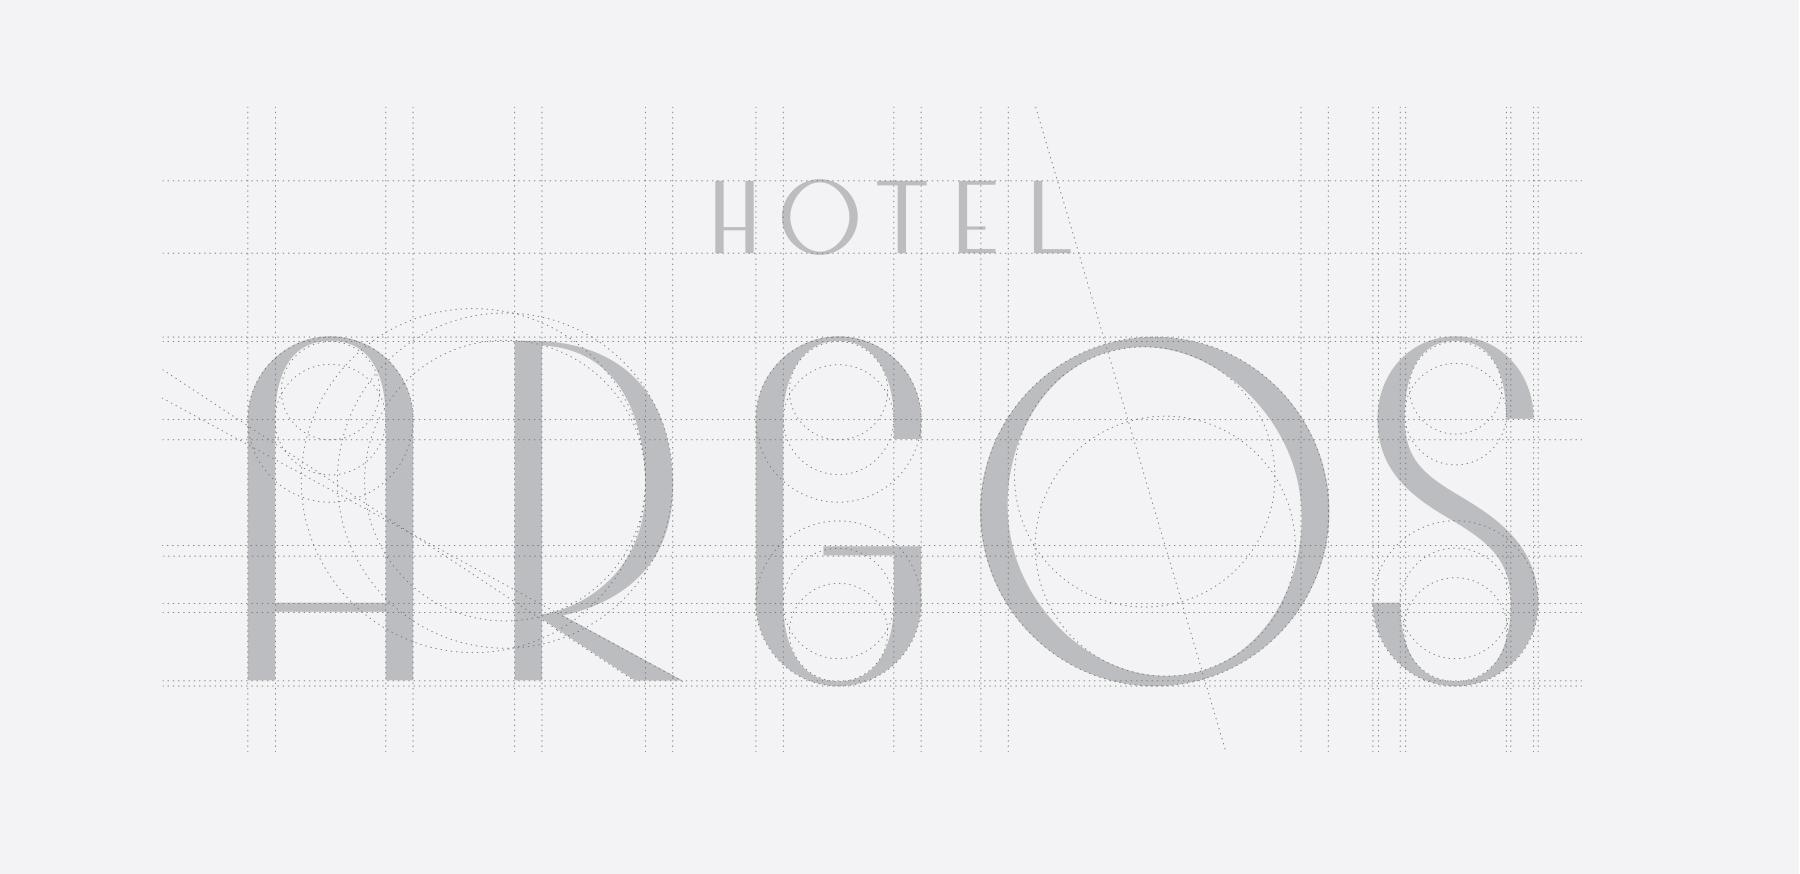 The construction of the Hotel Argos logo